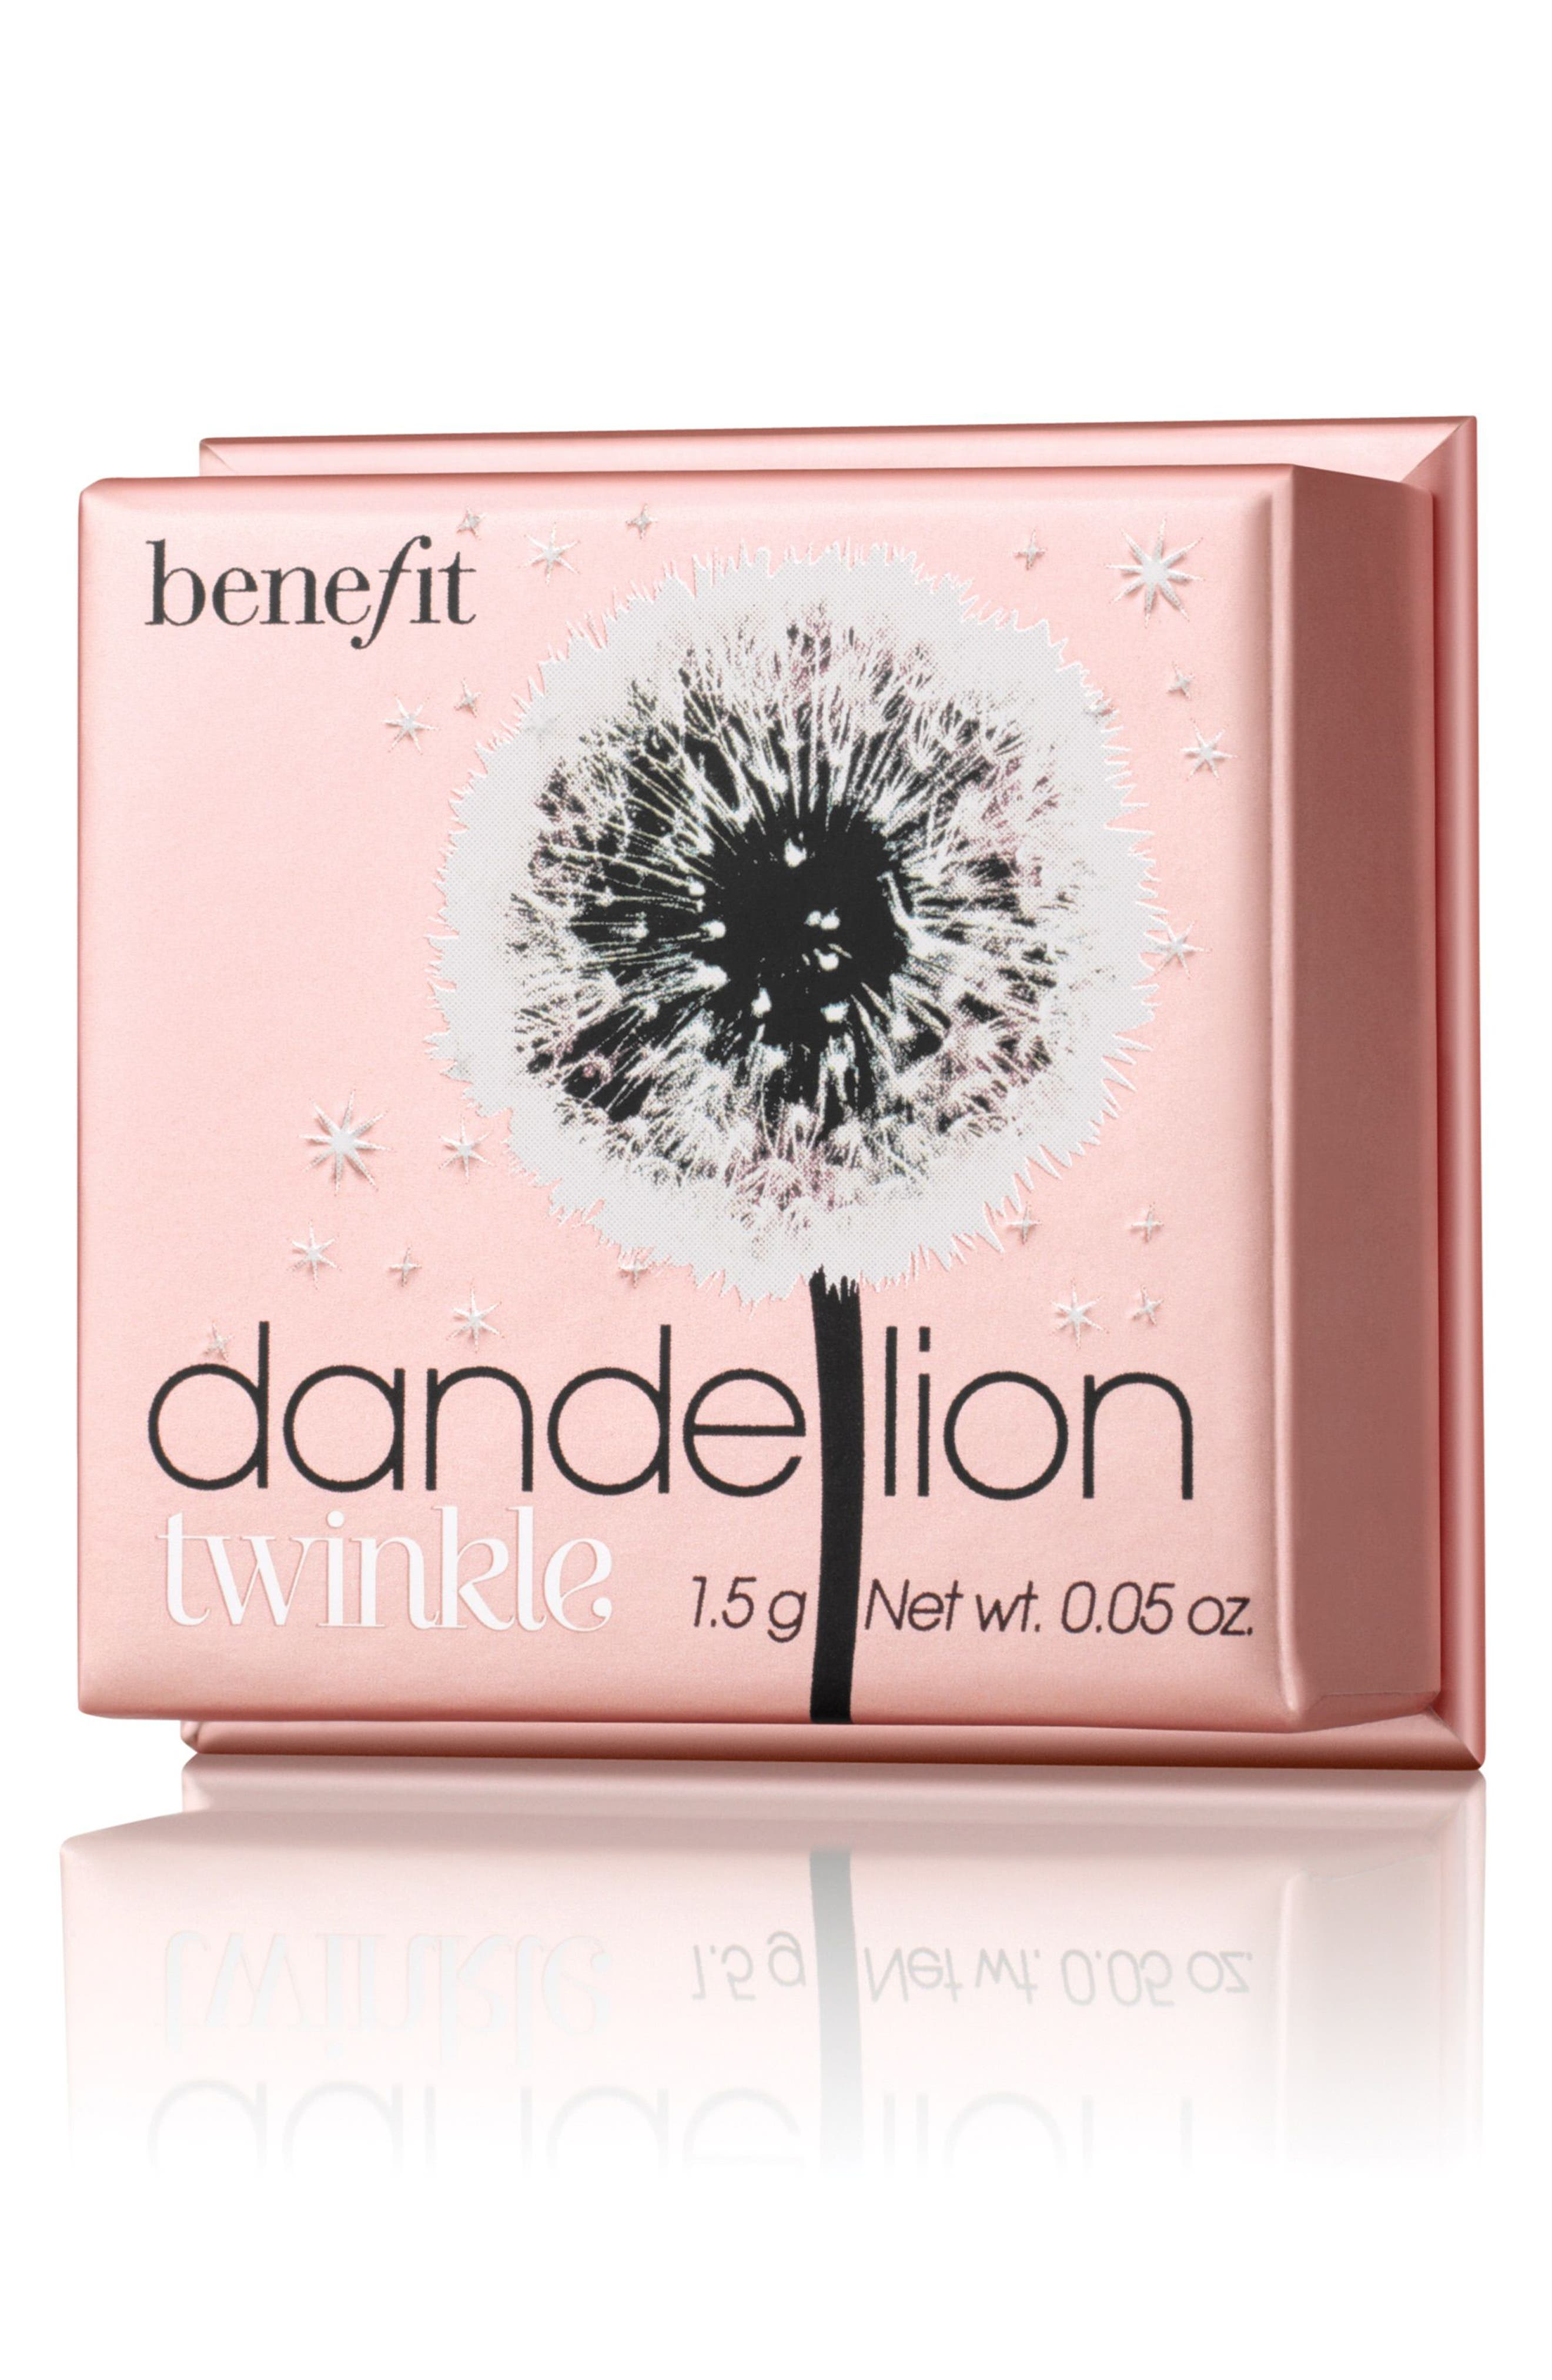 Benefit Dandelion Twinkle Powder Highlighter,                             Alternate thumbnail 4, color,                             NUDE PINK